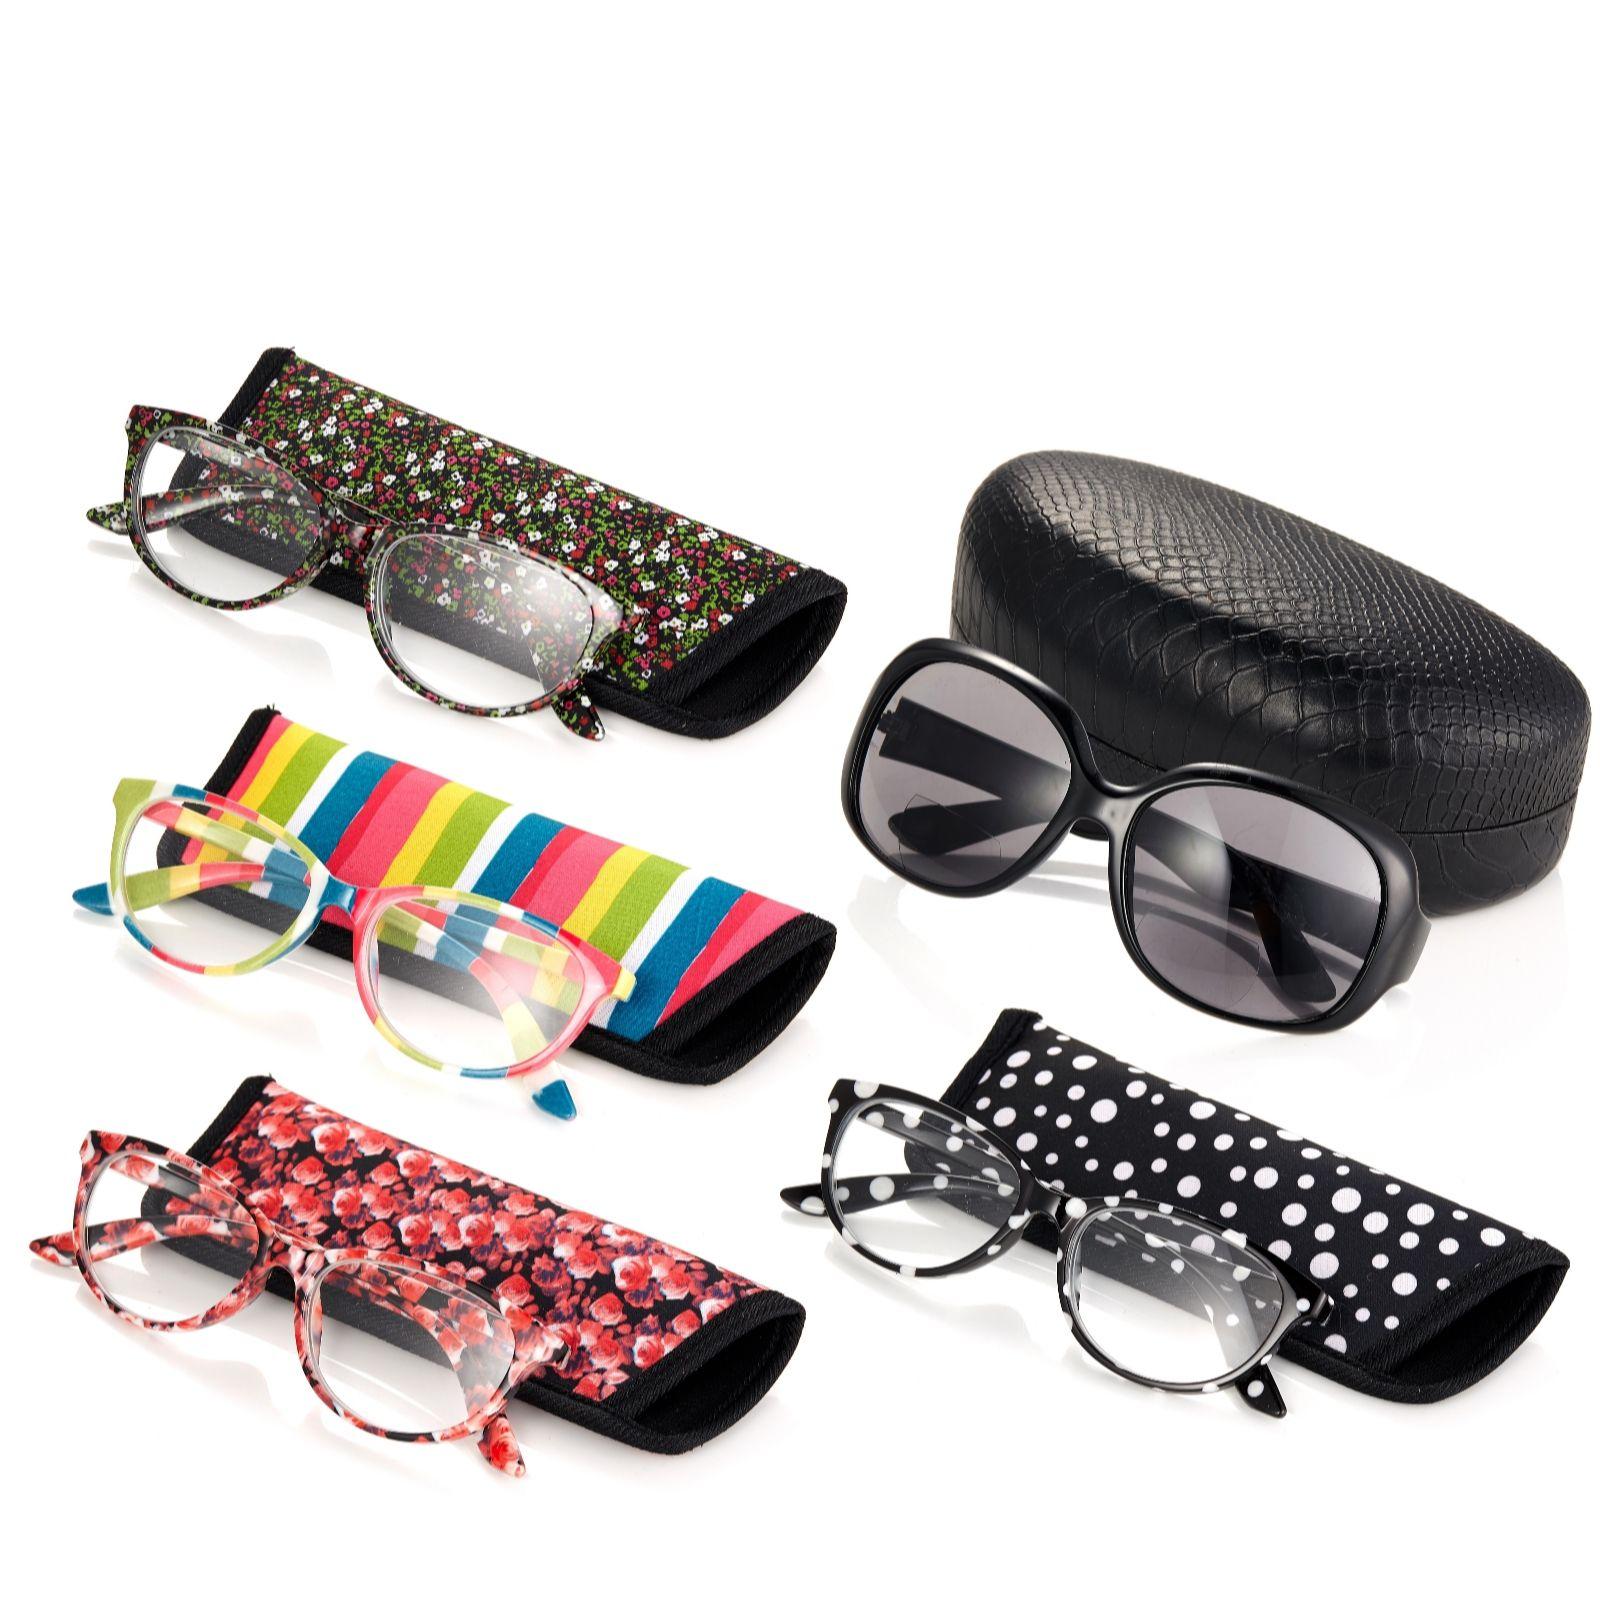 b564d2bb99 Set of 5 Reading Glasses Including 1 Pair of Bifocal Sunglasses - QVC ...